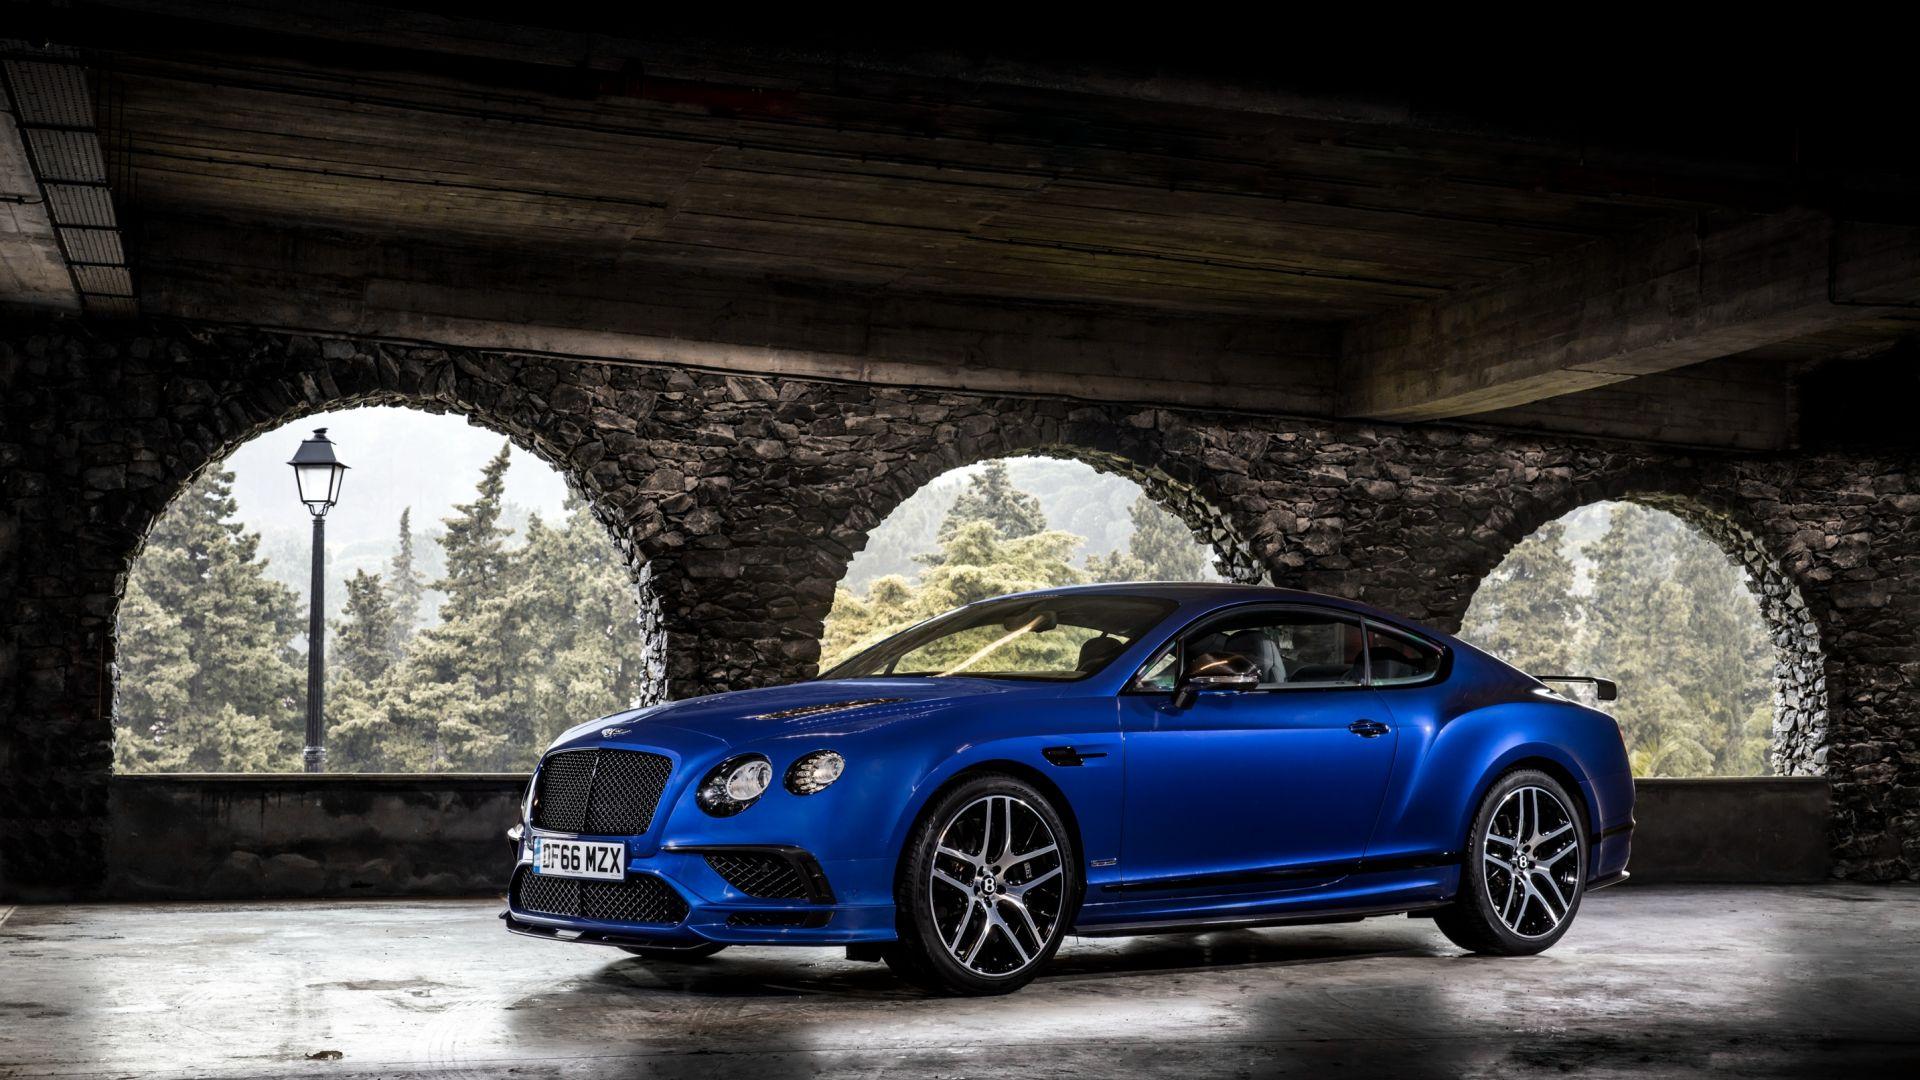 Wallpaper Bentley Continental GT, blue luxury car